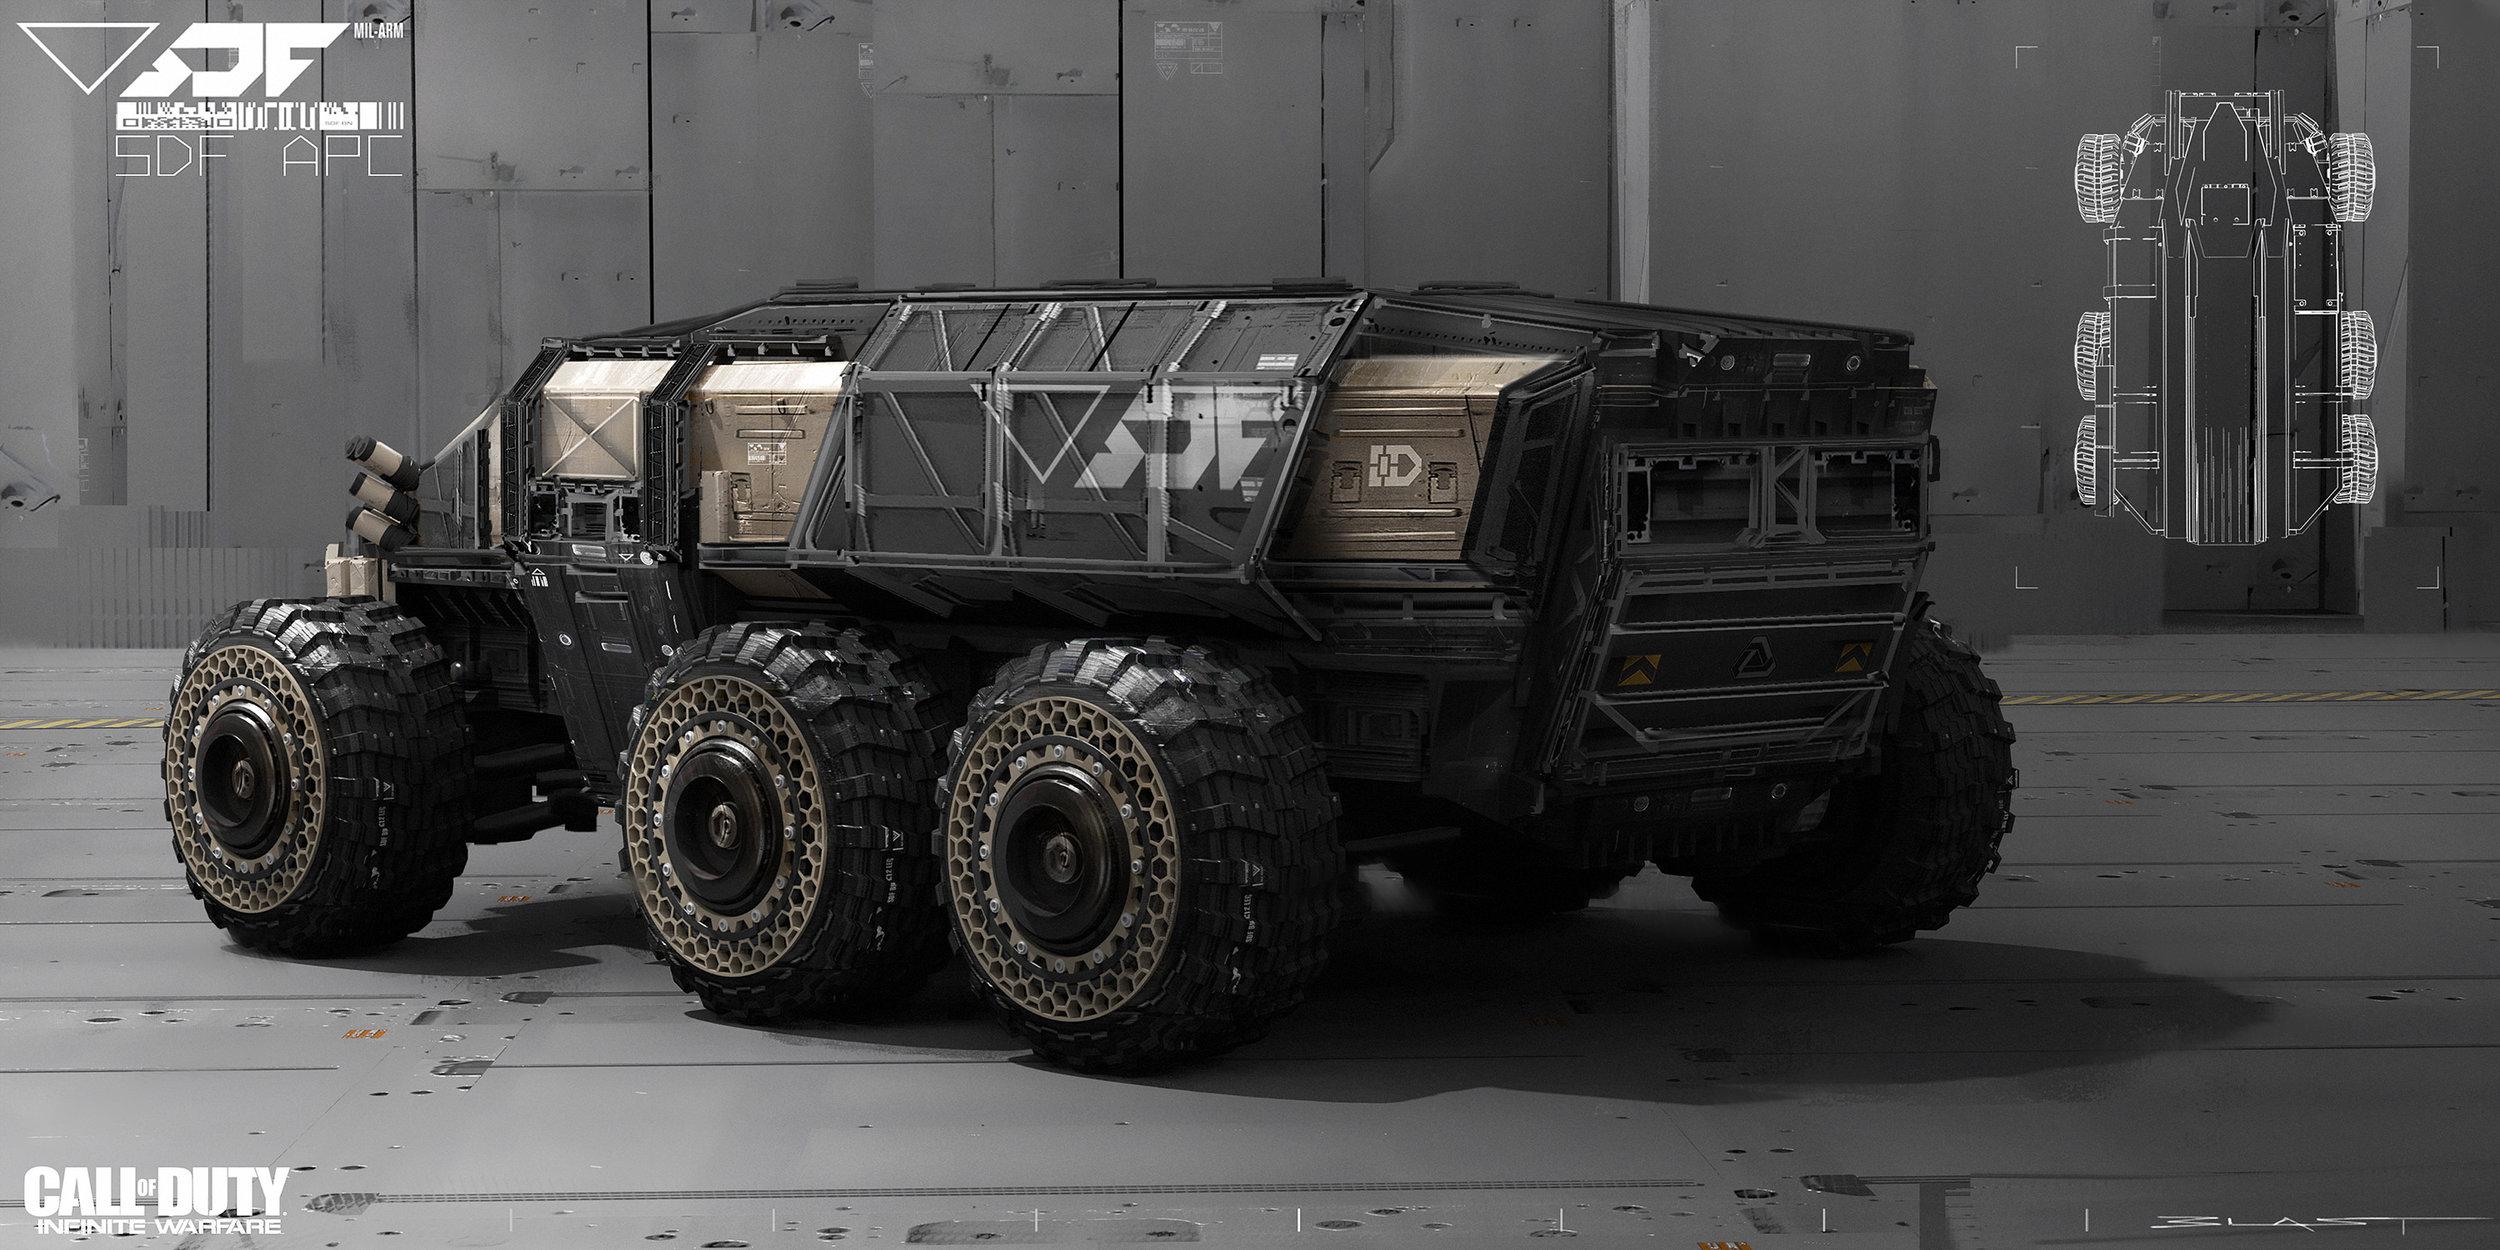 callofduty_benjaminlast_apc_vehicledesign_concept_2